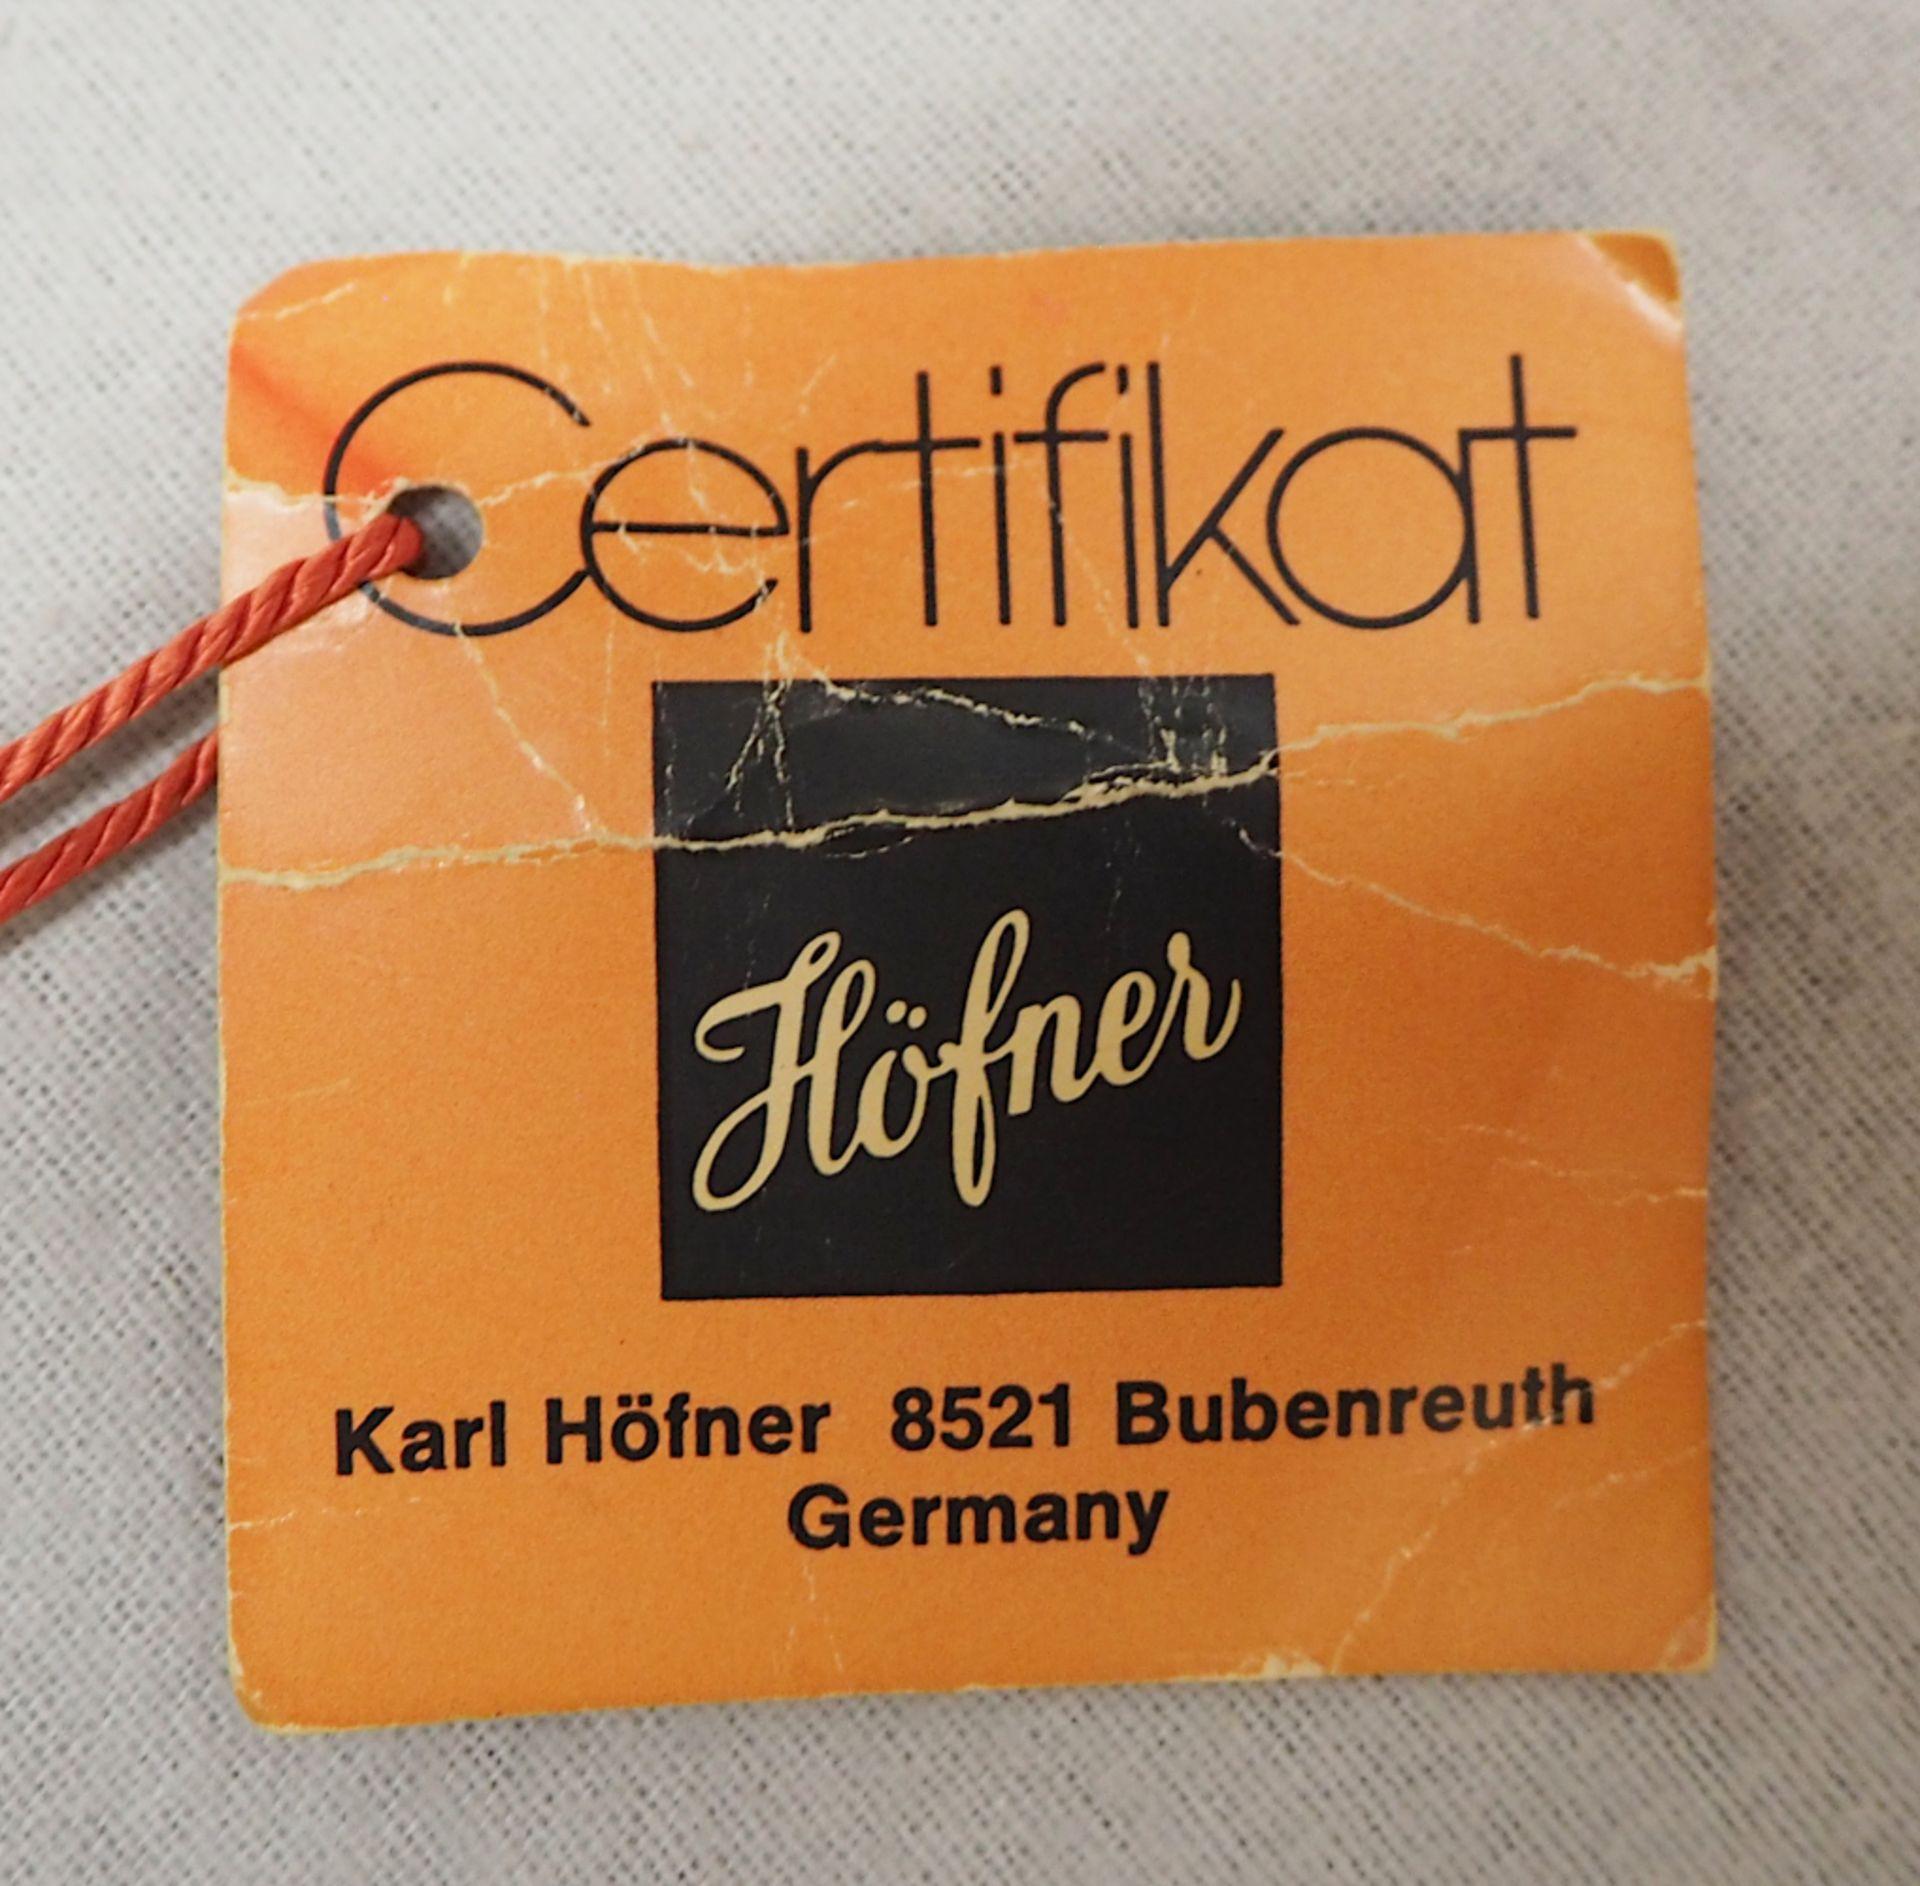 1 Konzert-Gitarre HÖFNER Modellnummer: 4840, wohl z.T. Rosenholz min. intarsiert auf - Bild 2 aus 8